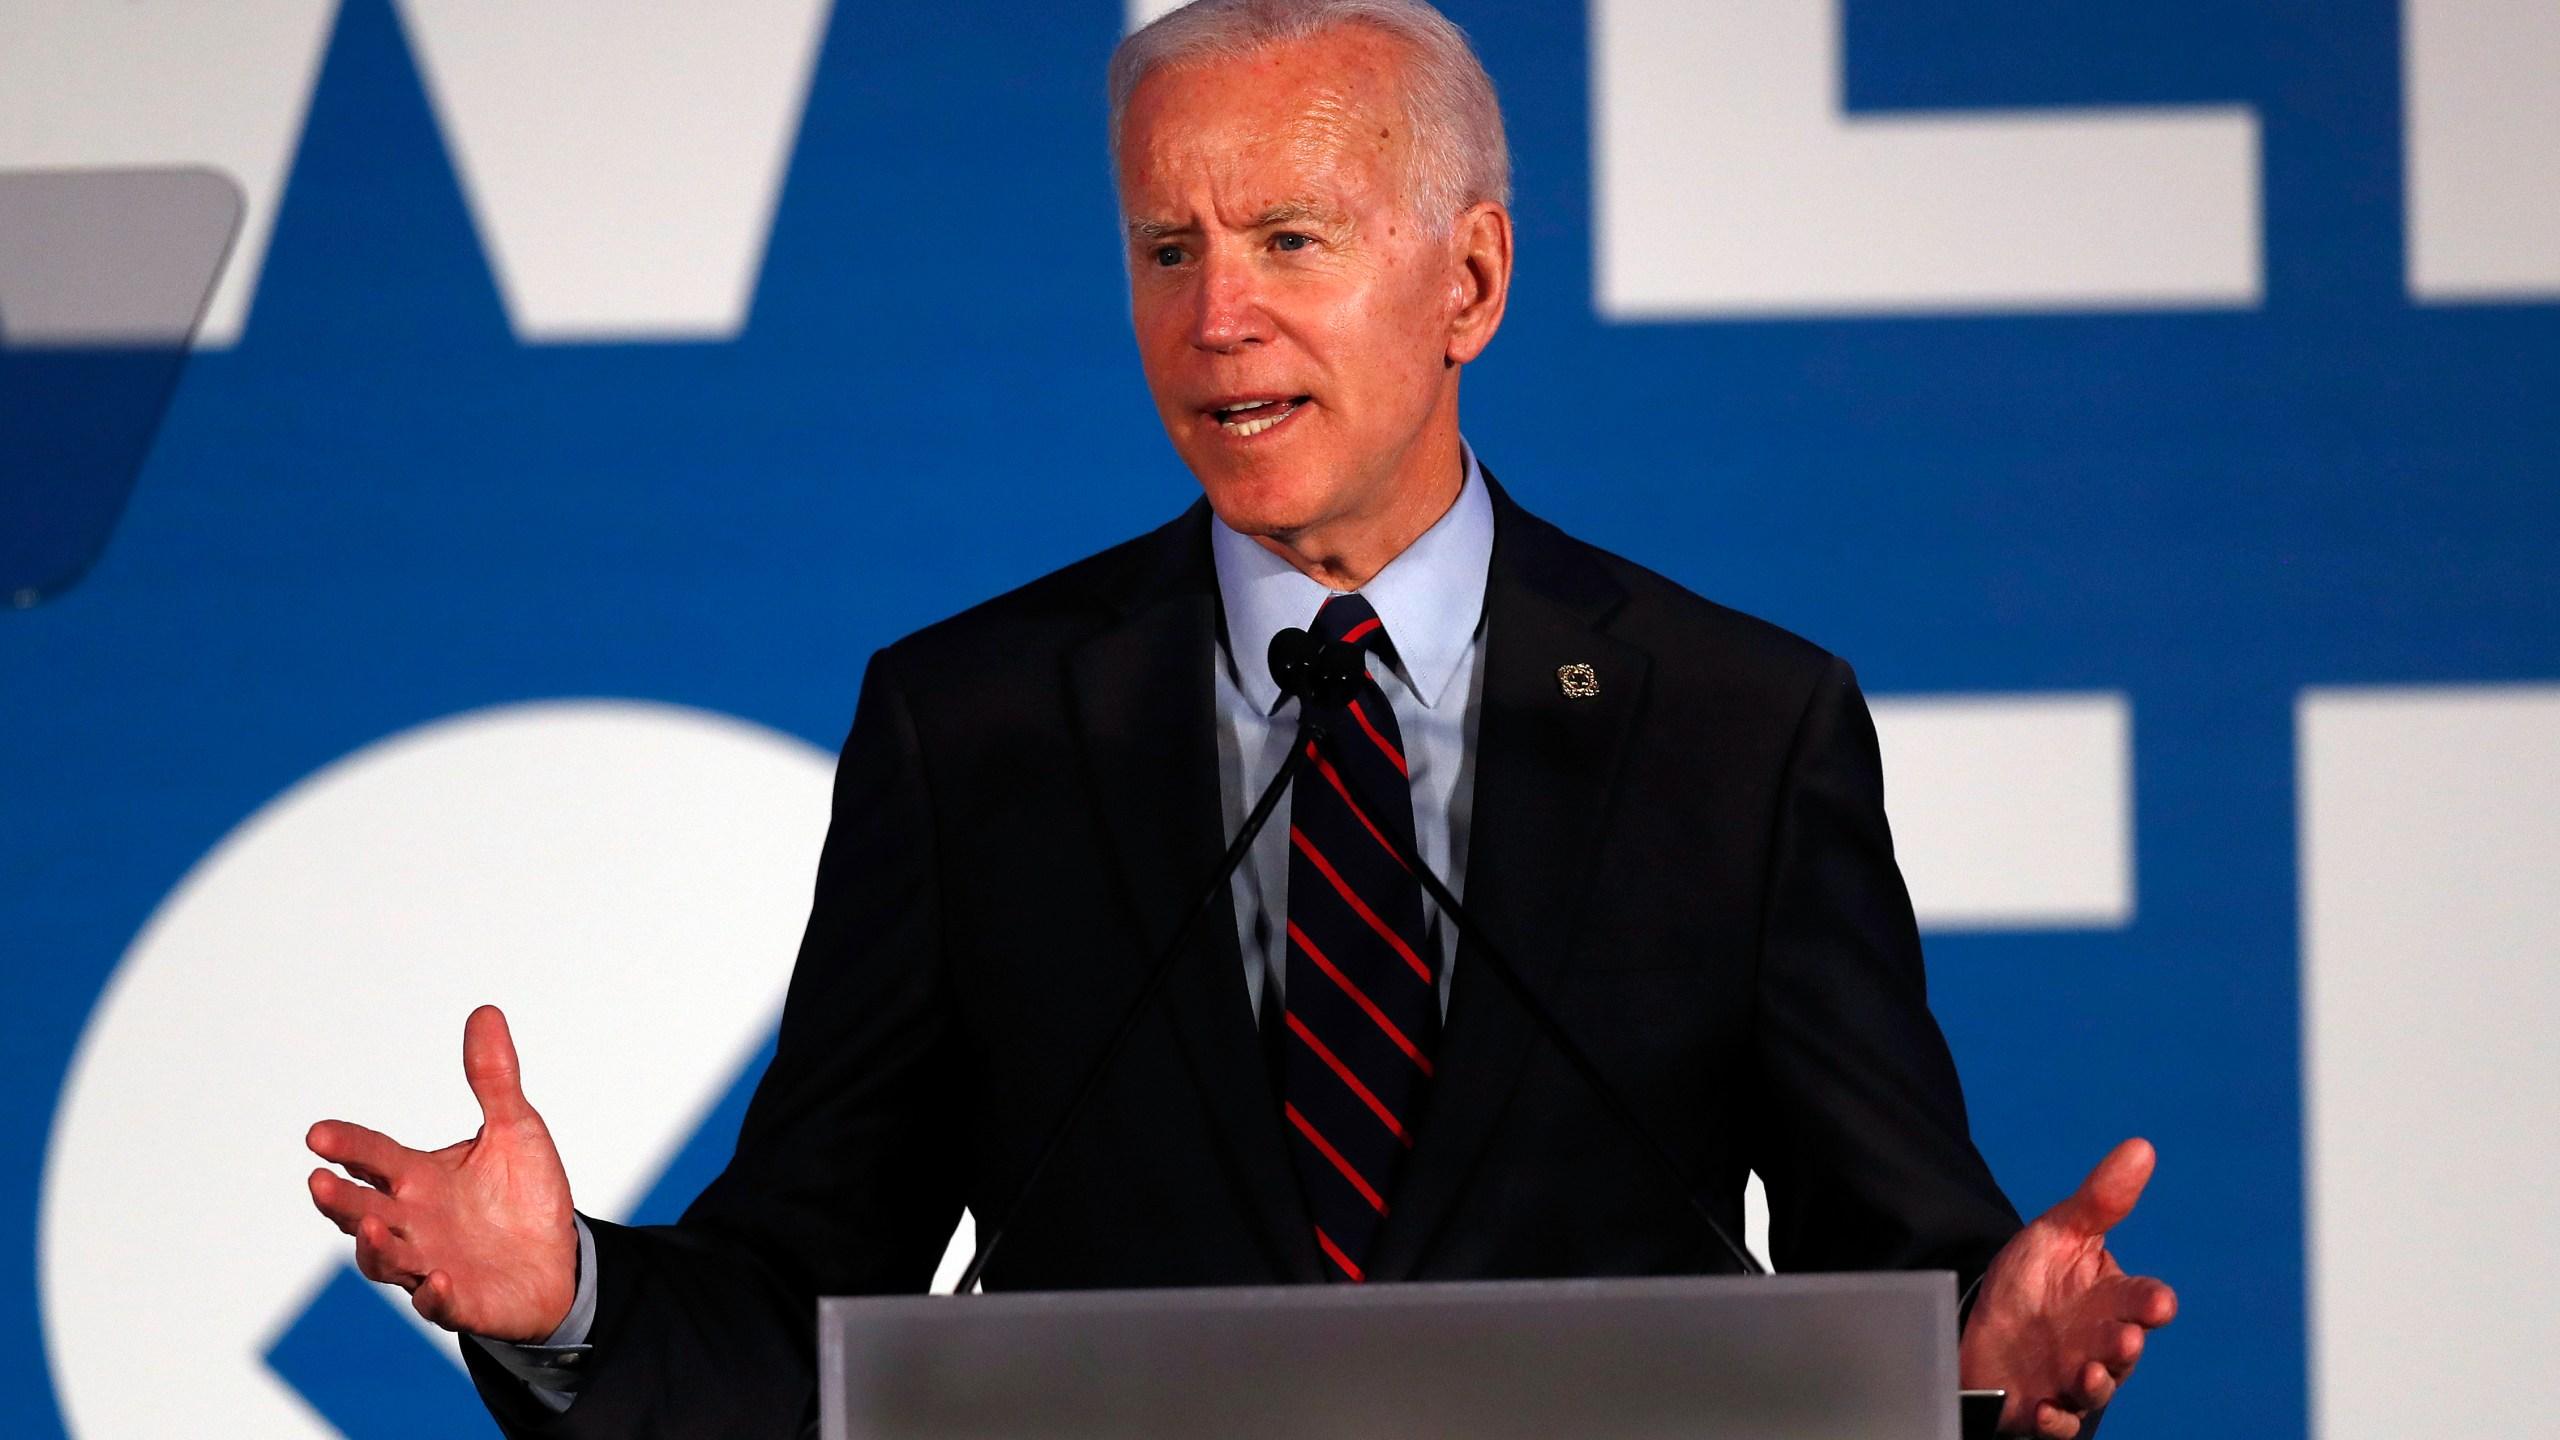 Election_2020_Joe_Biden_01659-159532.jpg89112387